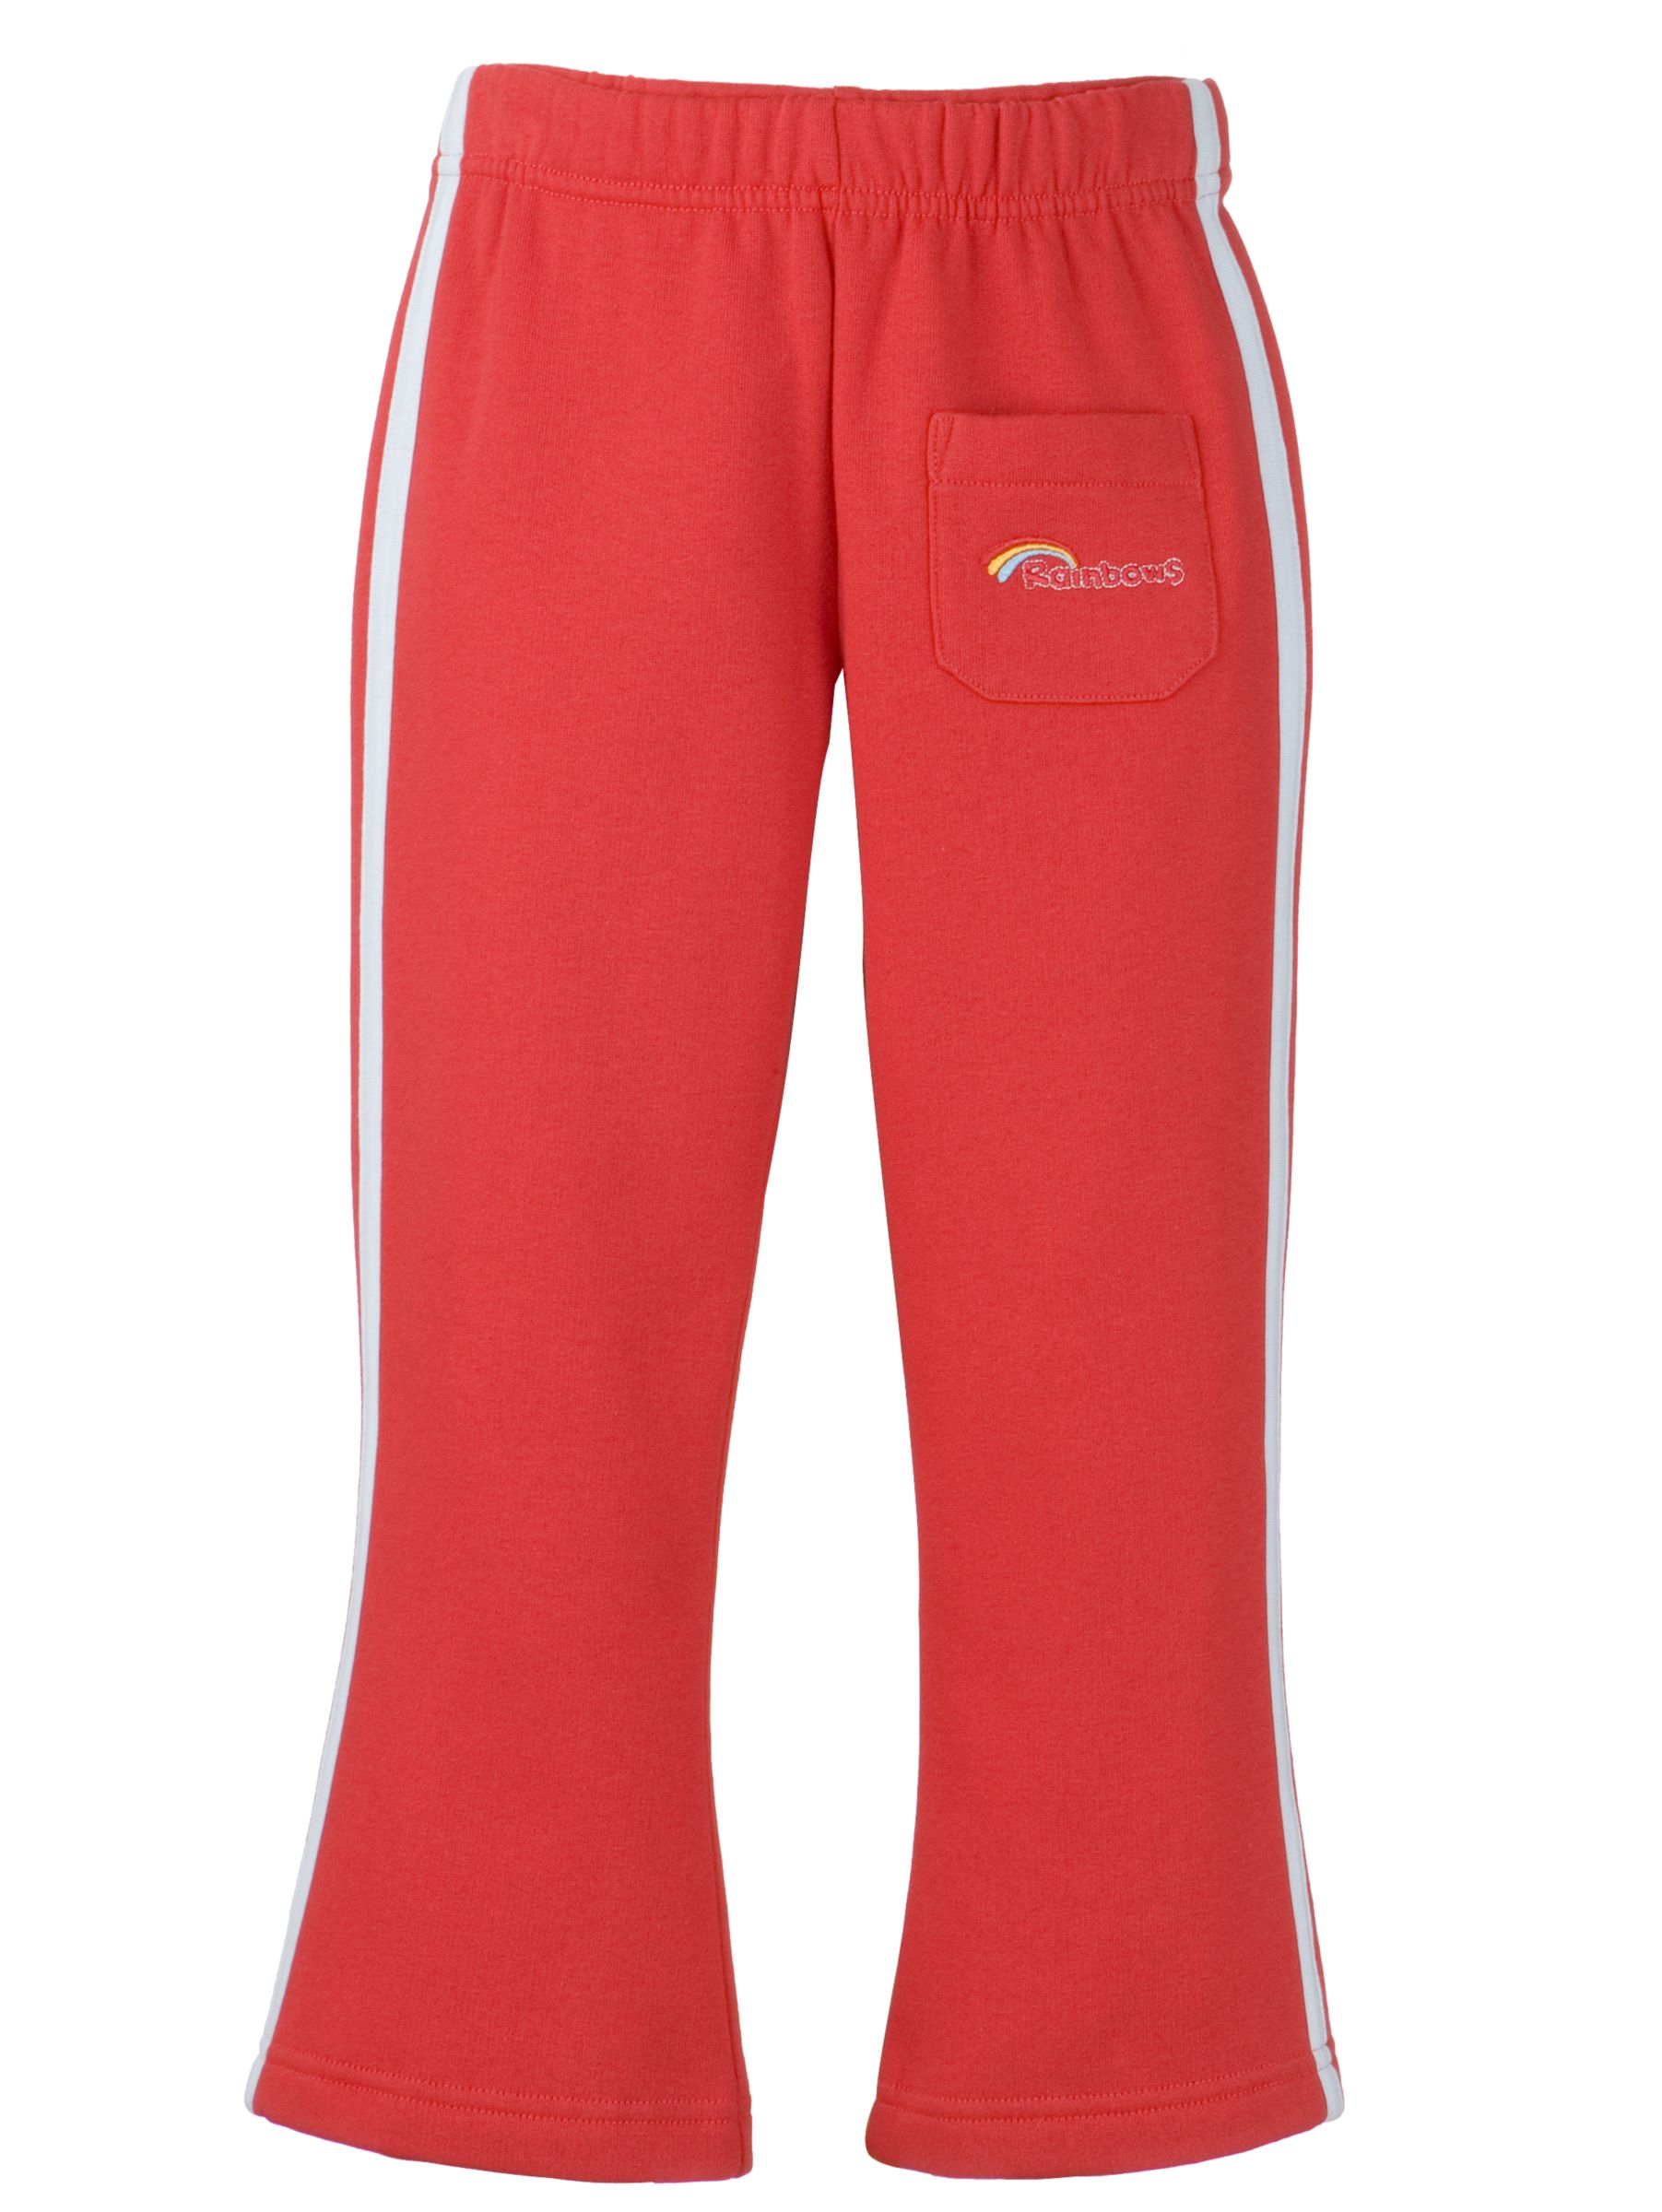 Rainbows Rainbows Uniform Jogging Trousers, Red